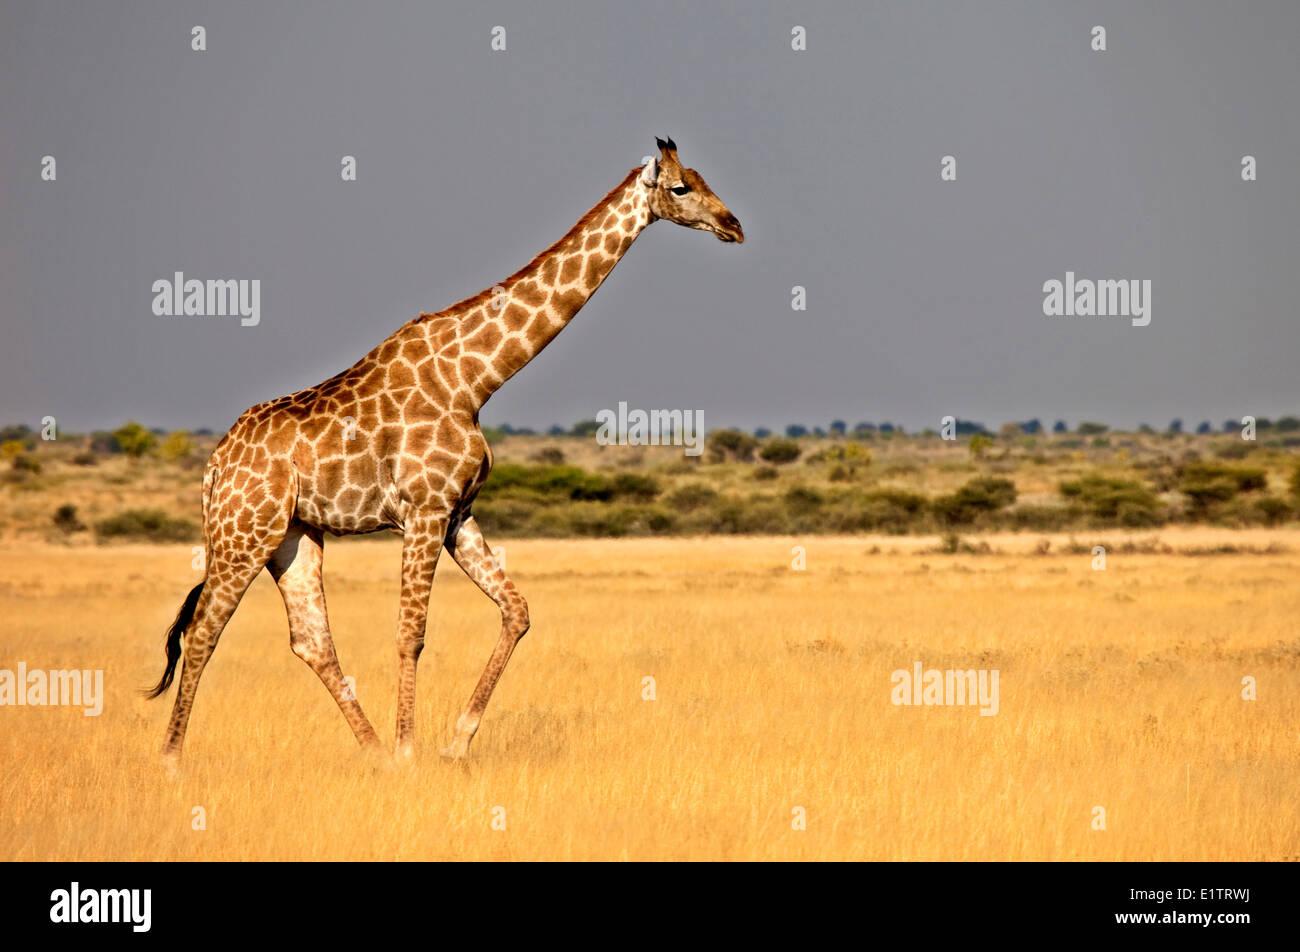 Giraffe, giraffa camelopardalis, Central Kalahari Game Reserve, Botswana, Africa - Stock Image